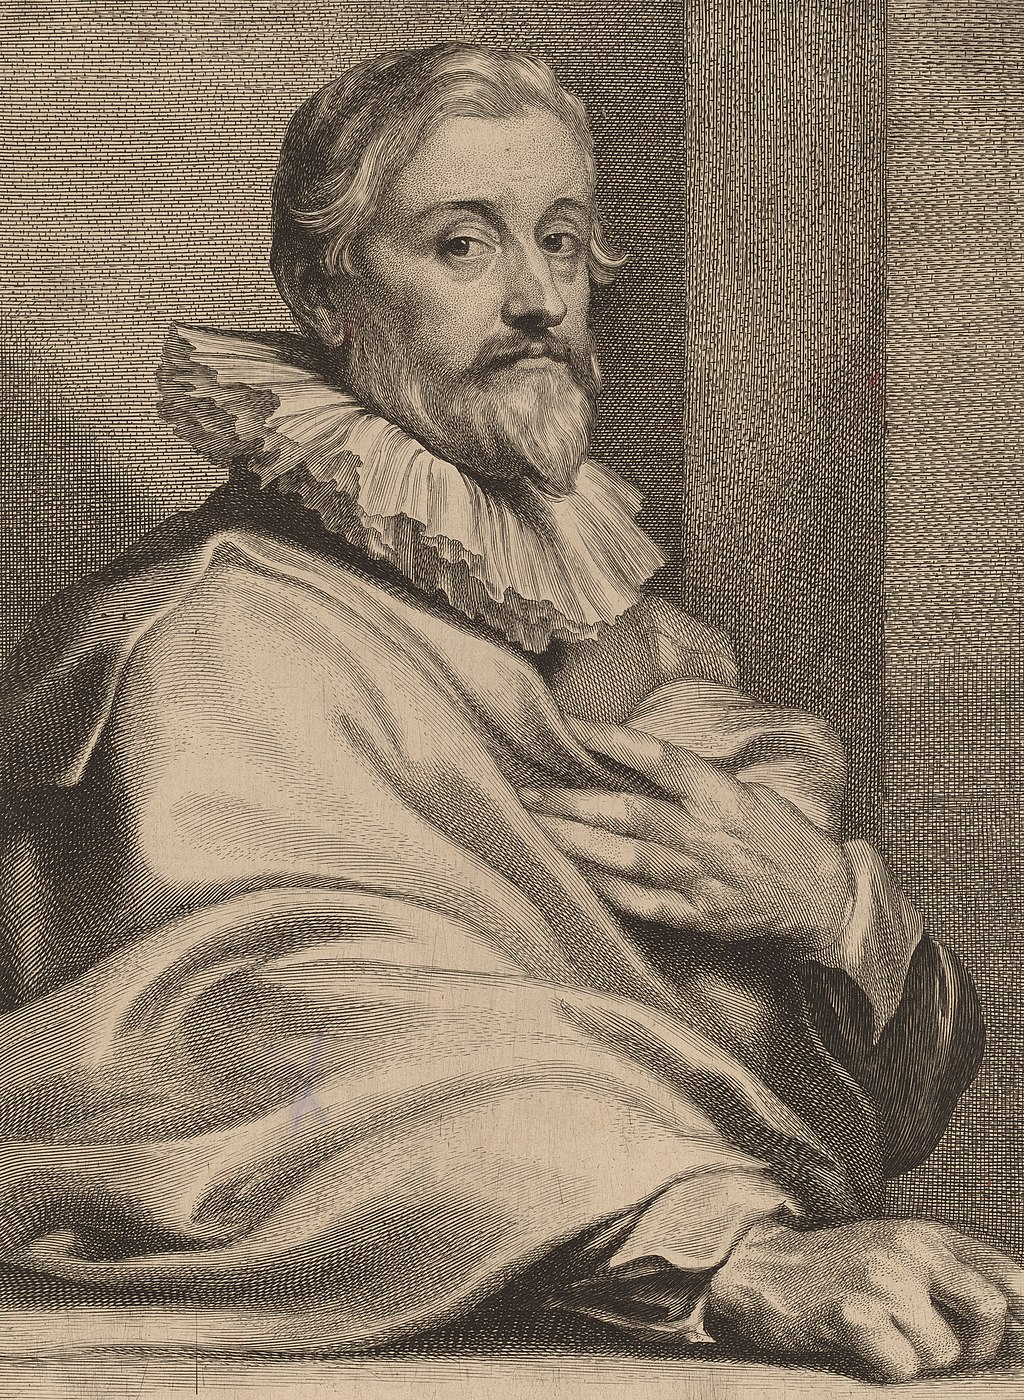 1024px-Lucas_Emil_Vorsterman_after_Sir_Anthony_van_Dyck,_Pieter_de_Jode_the_Elder,_probably_1626-1641,_NGA_39259_(cropped)